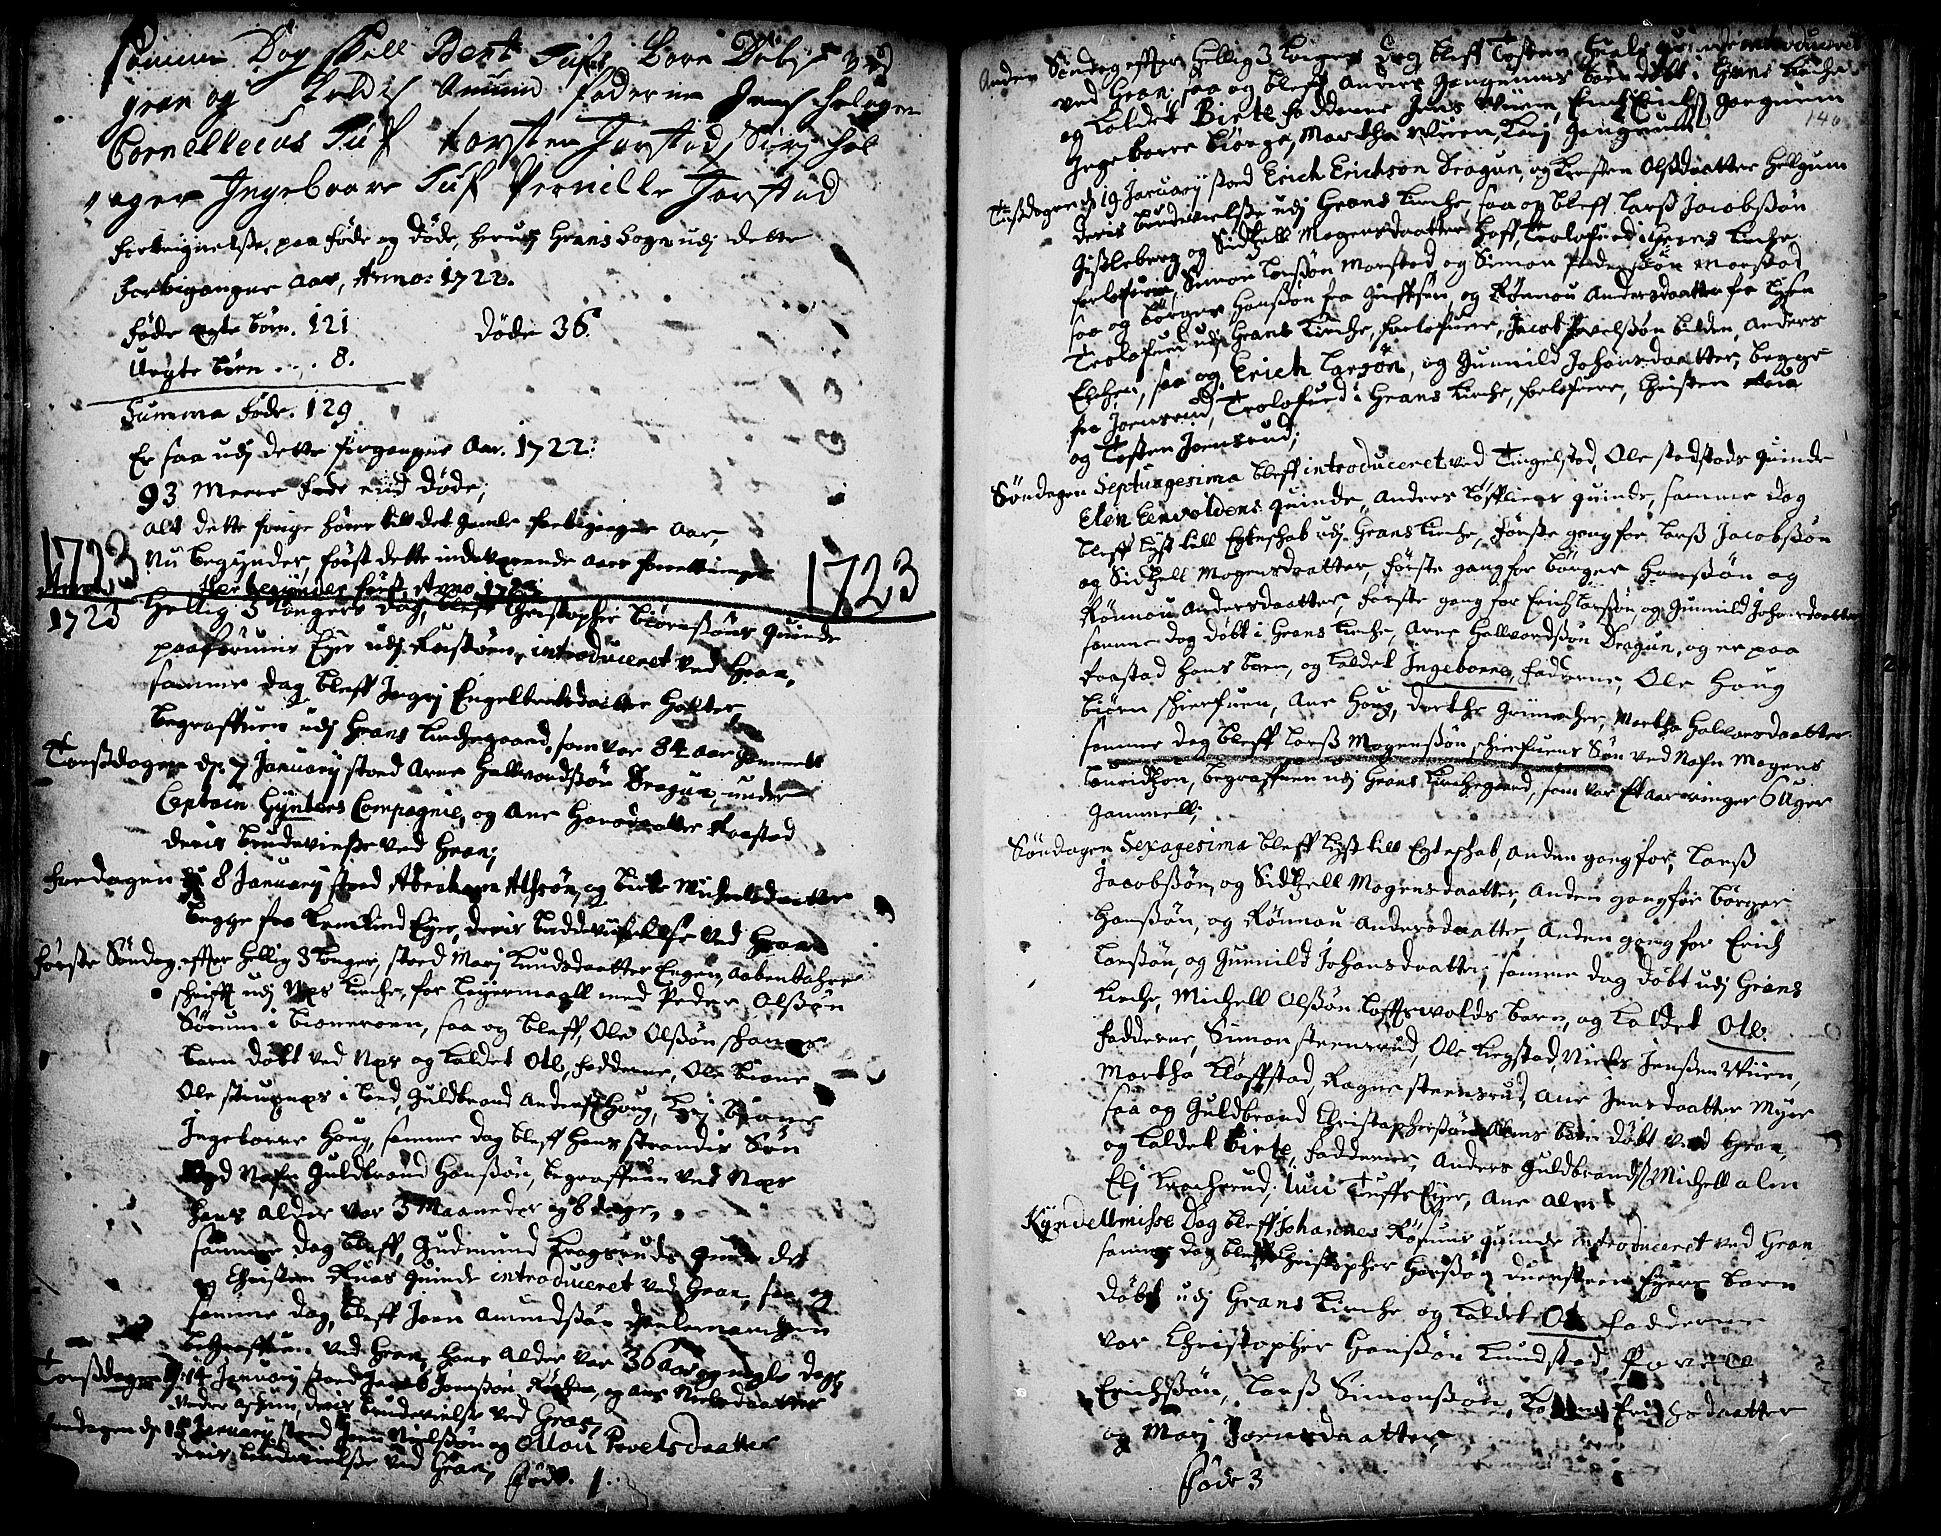 SAH, Gran prestekontor, Ministerialbok nr. 1, 1707-1731, s. 146